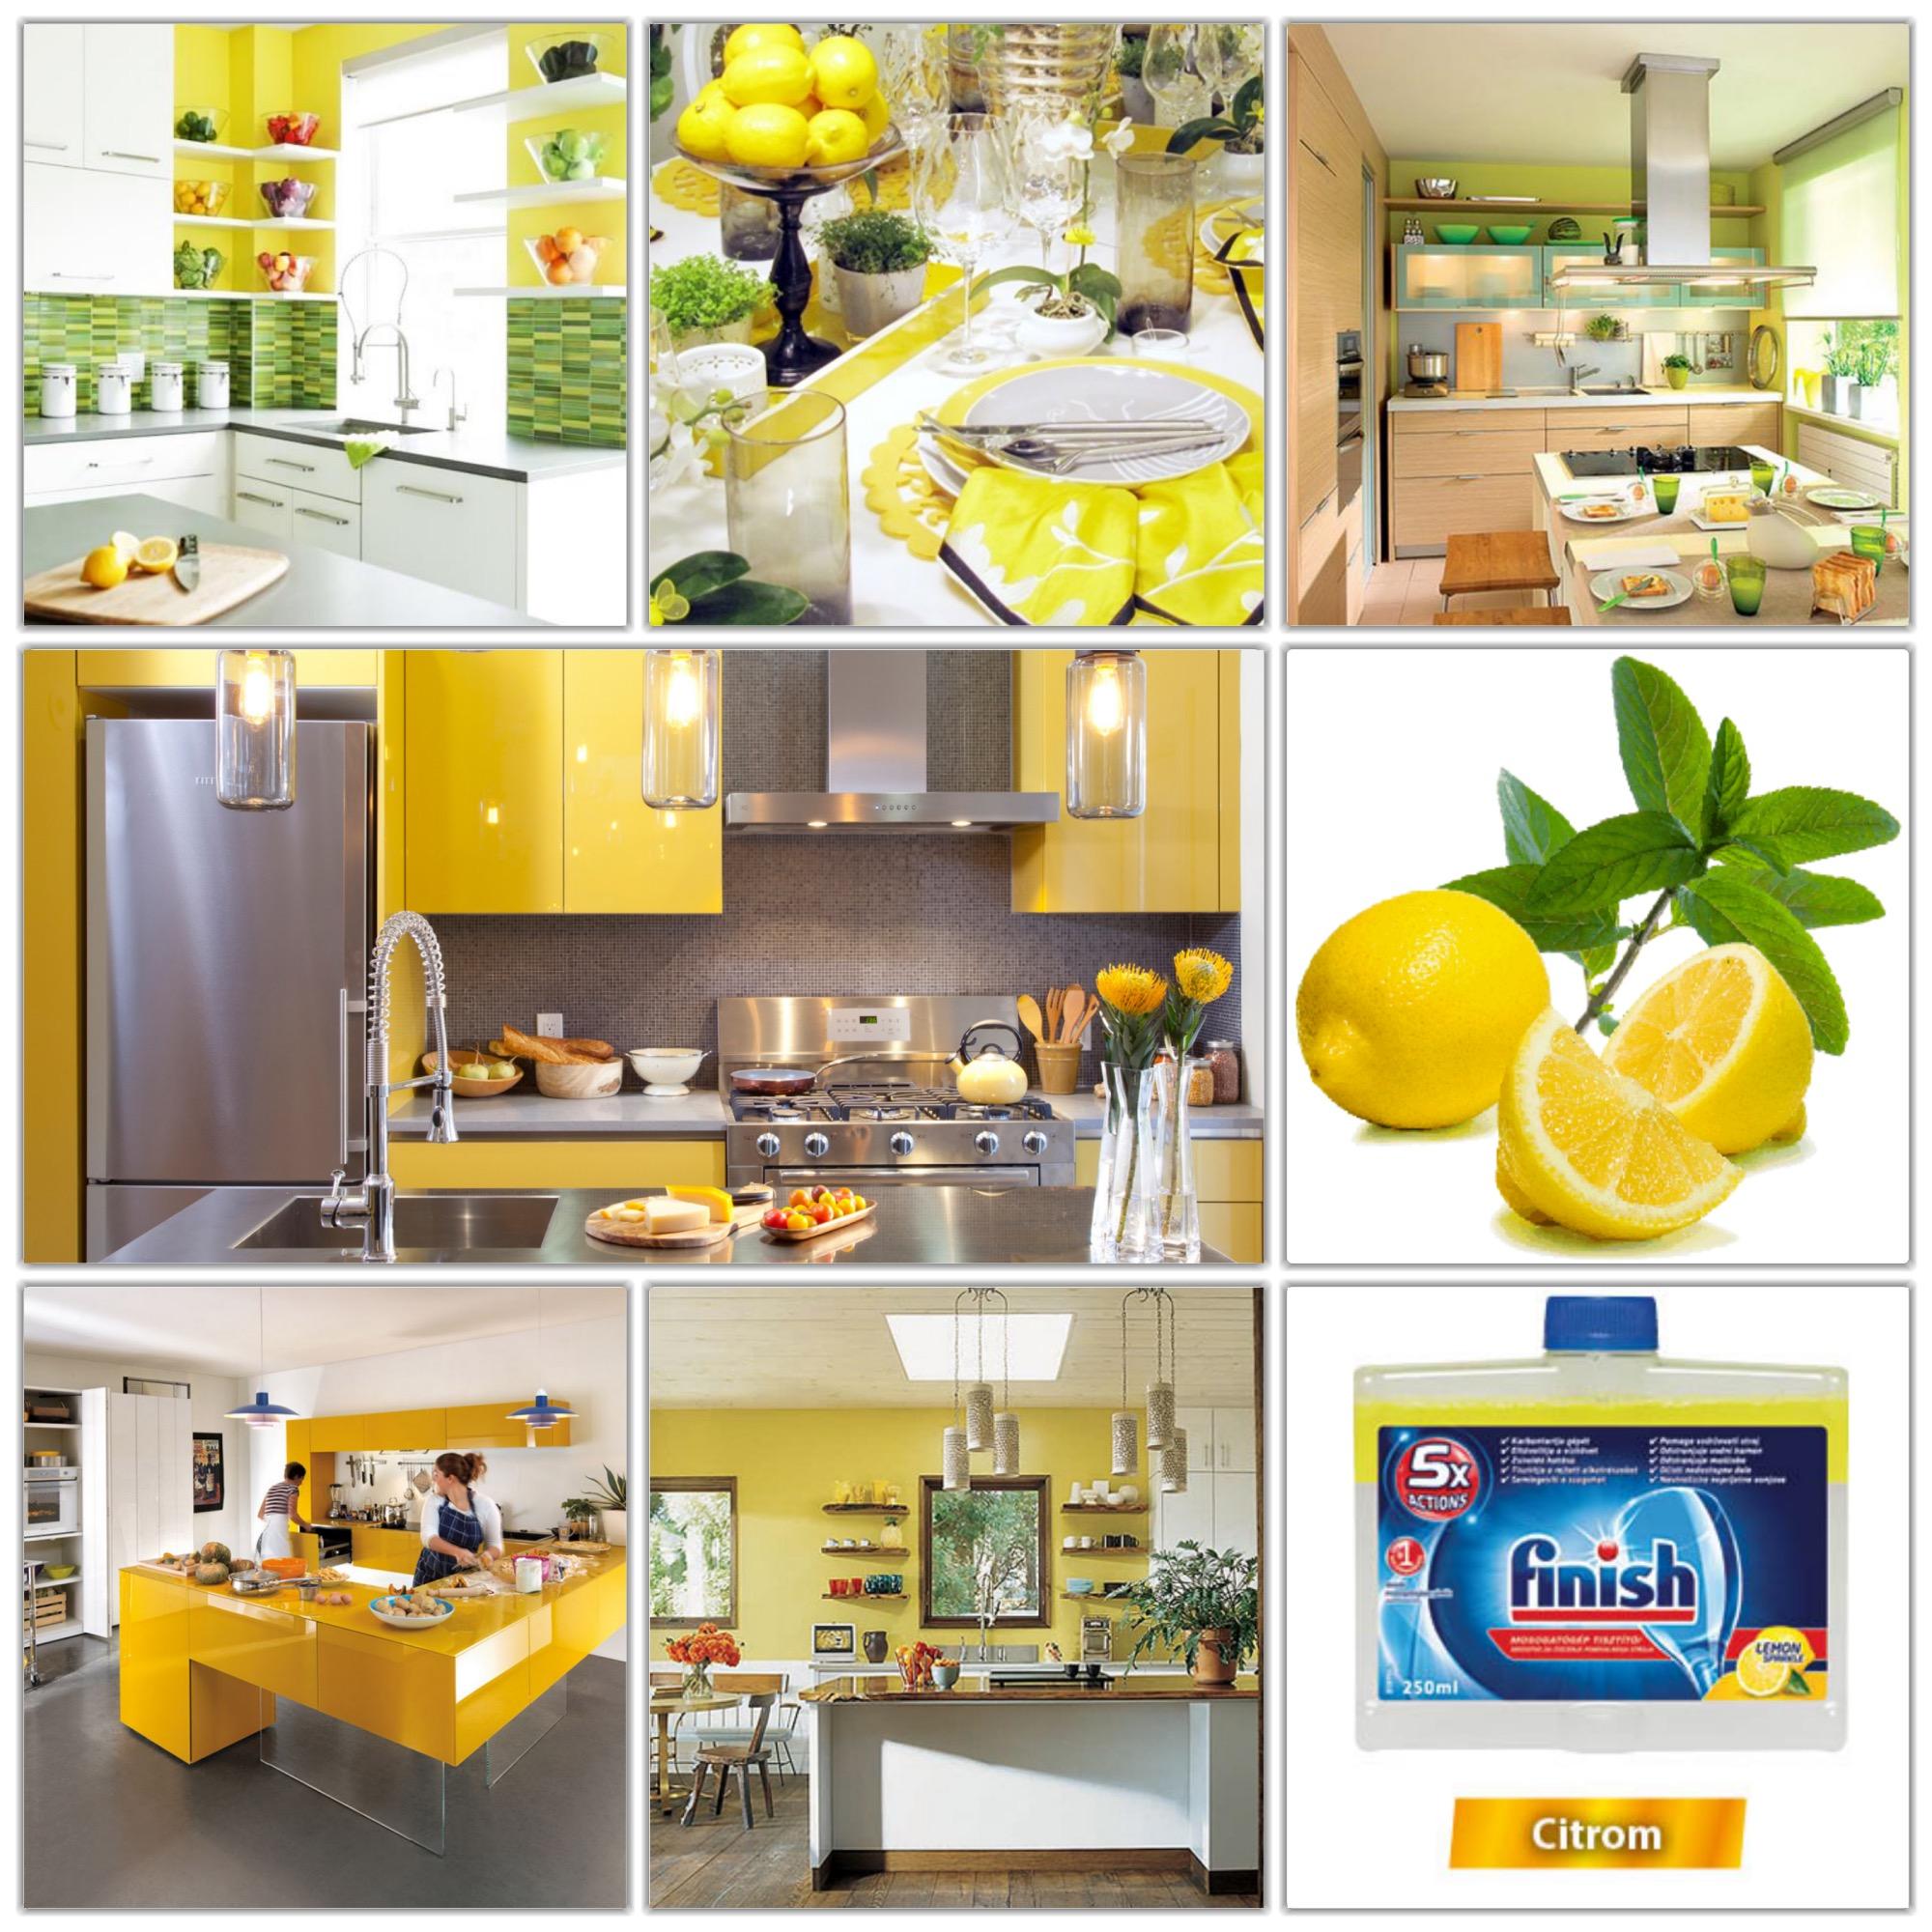 citrom_mix2.jpg